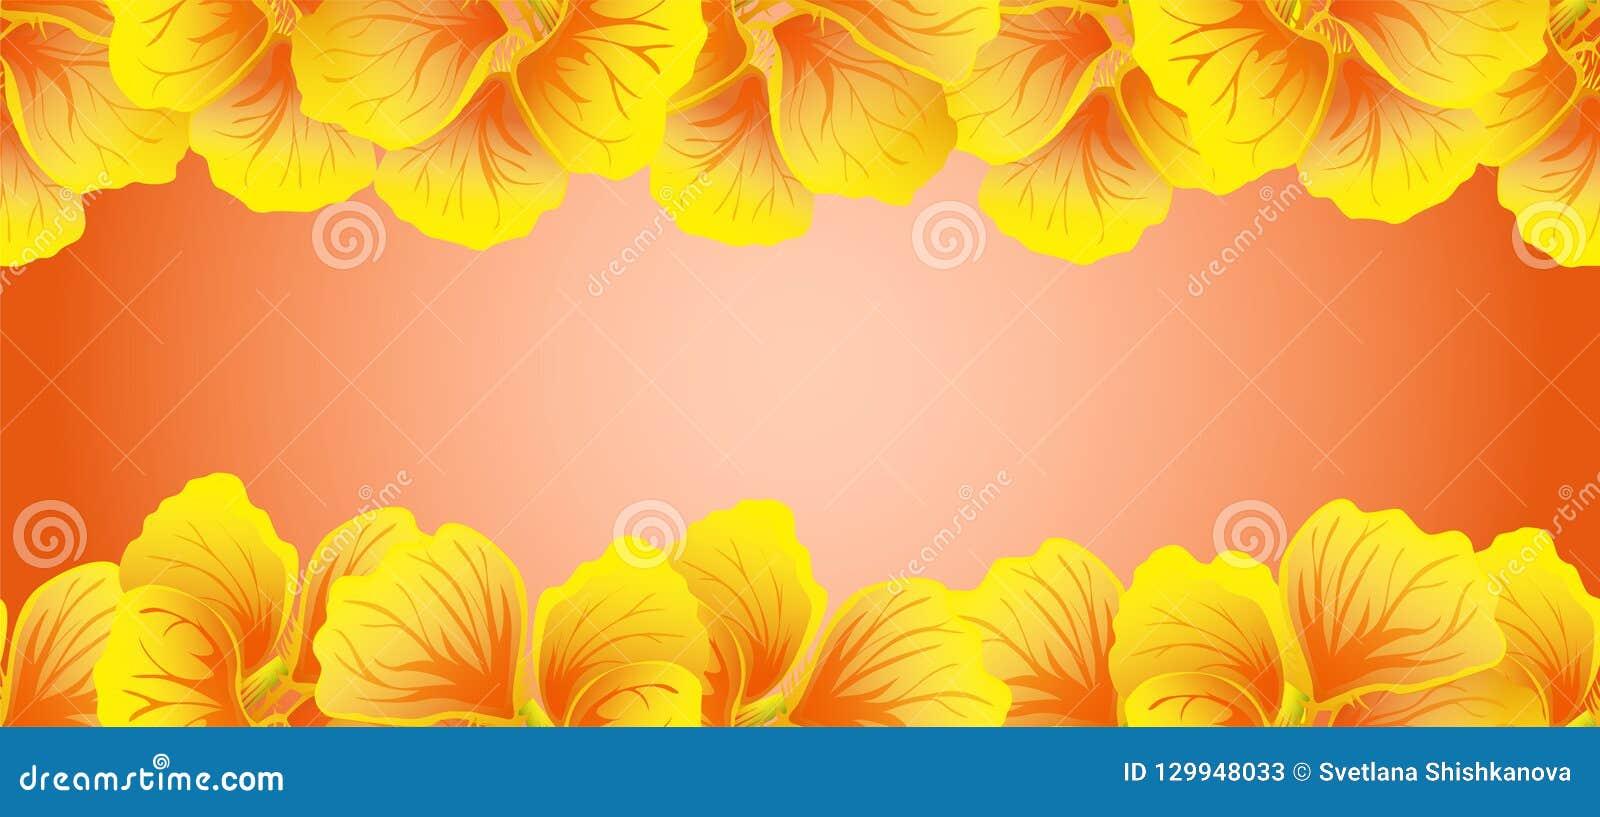 Bright Nasturtium Seamless border. Yellow flowers. Beautiful Horizontal banner. Red background. Card, invitation, poster, greeting